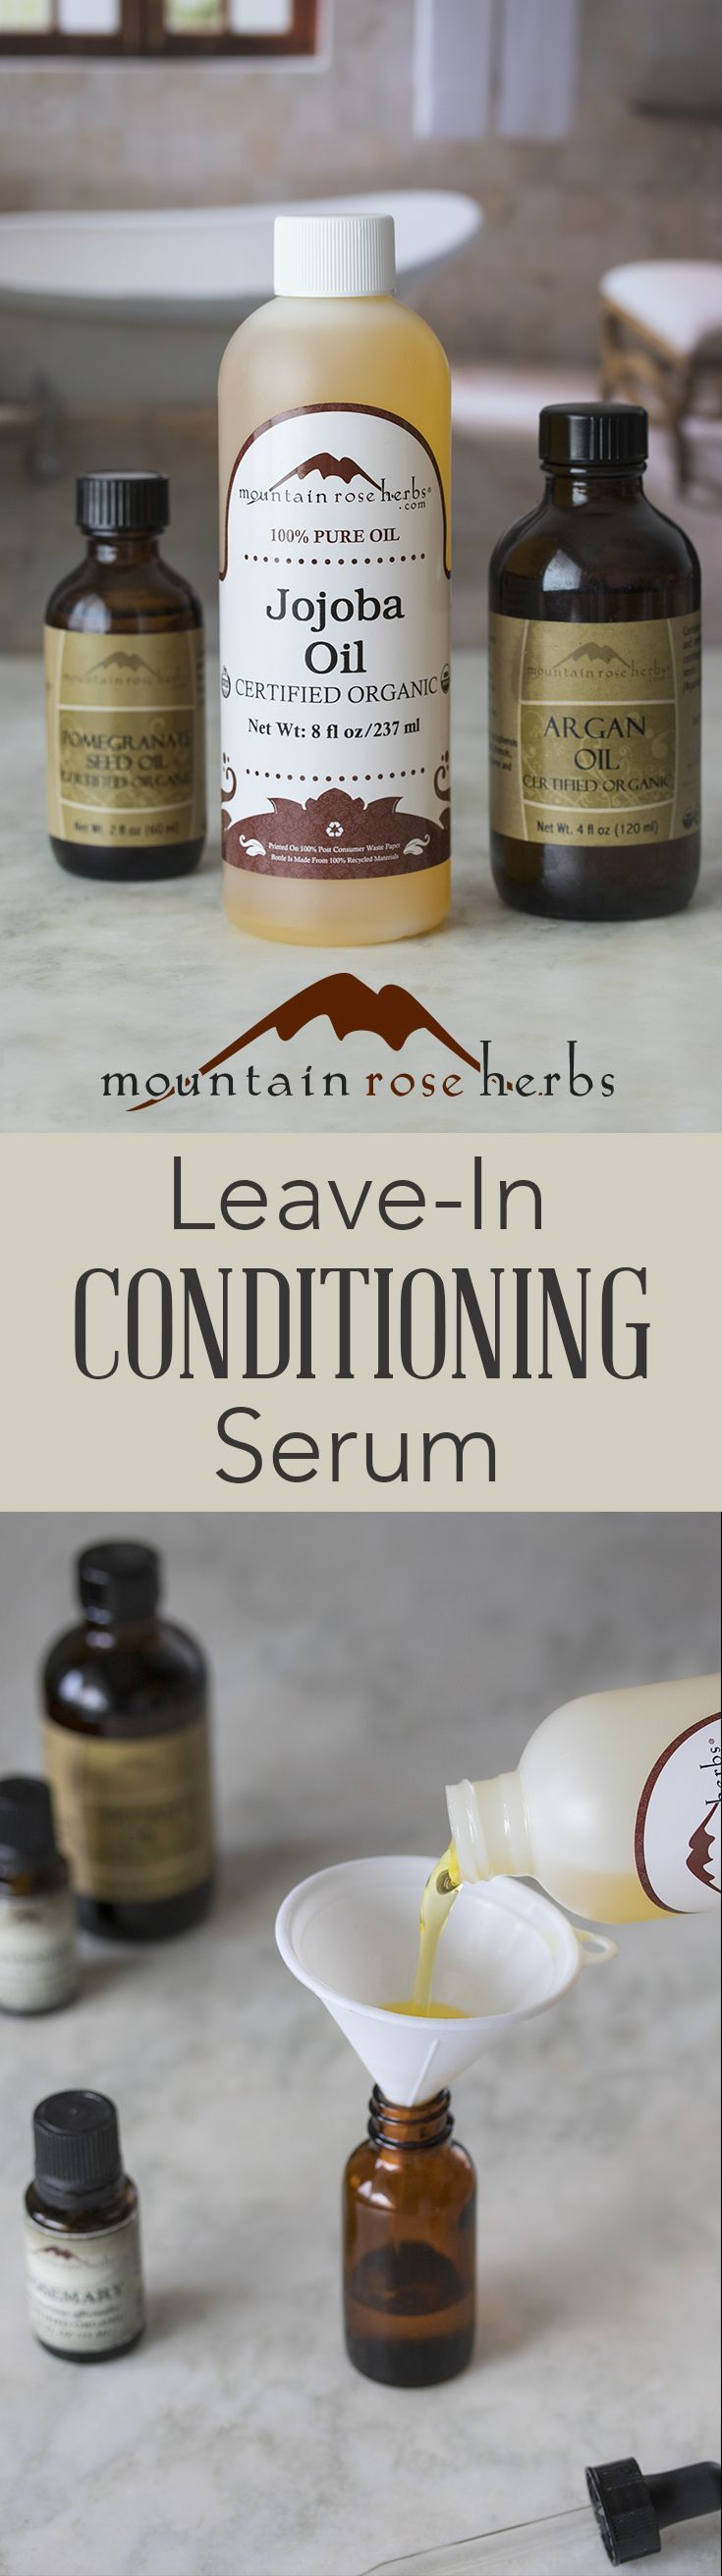 Diy leavein conditioner with jojoba argan oils recipe